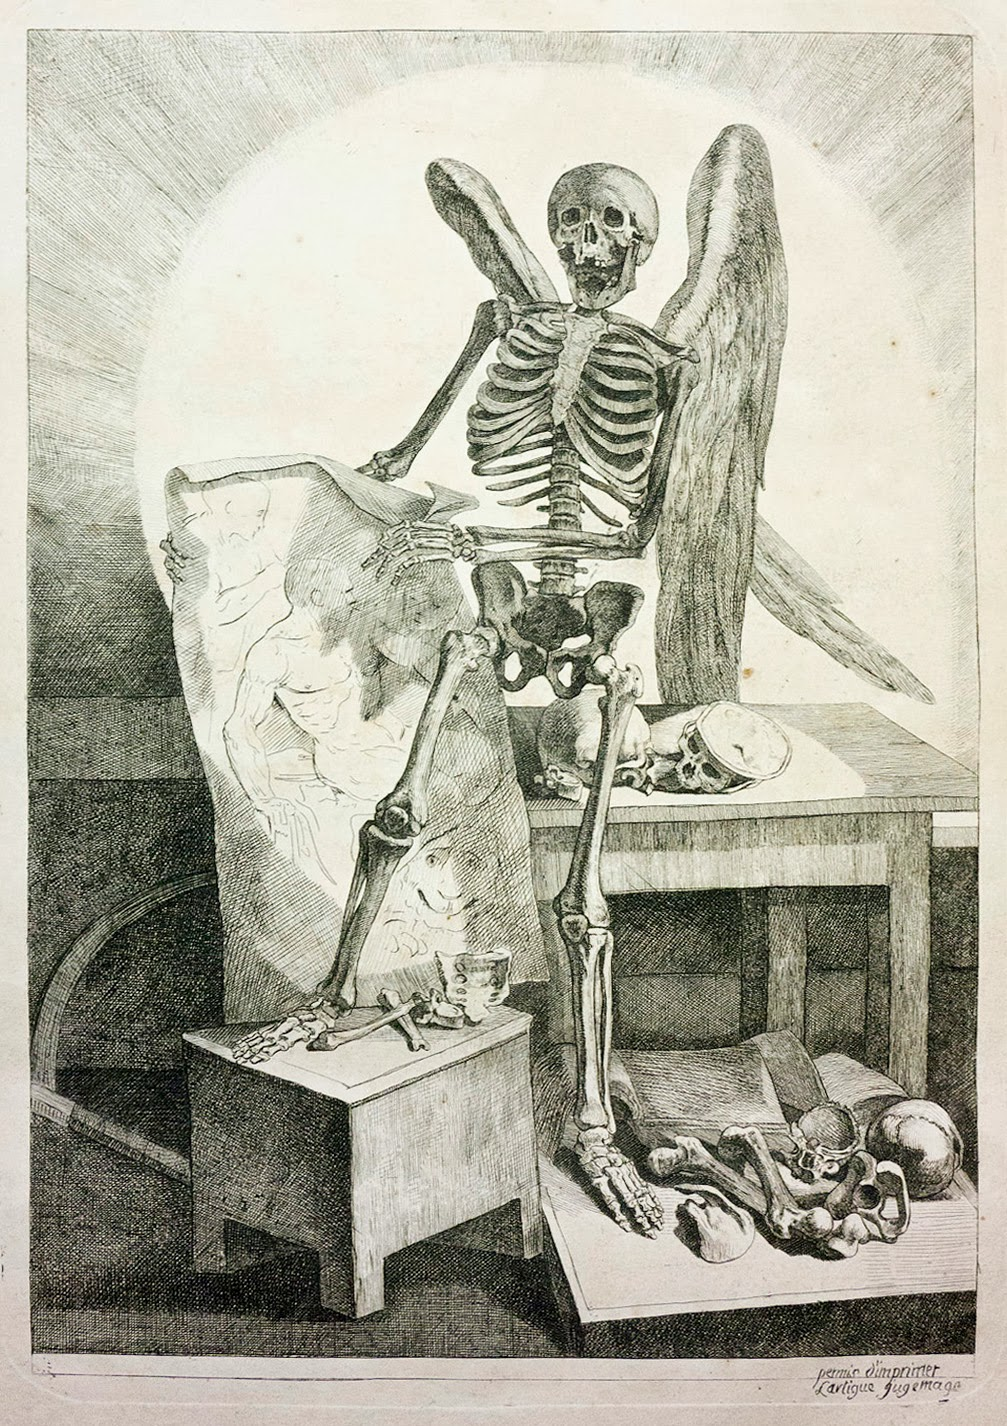 Morbid Anatomy: This Saturday: New York Academy of Medicine Festival ...